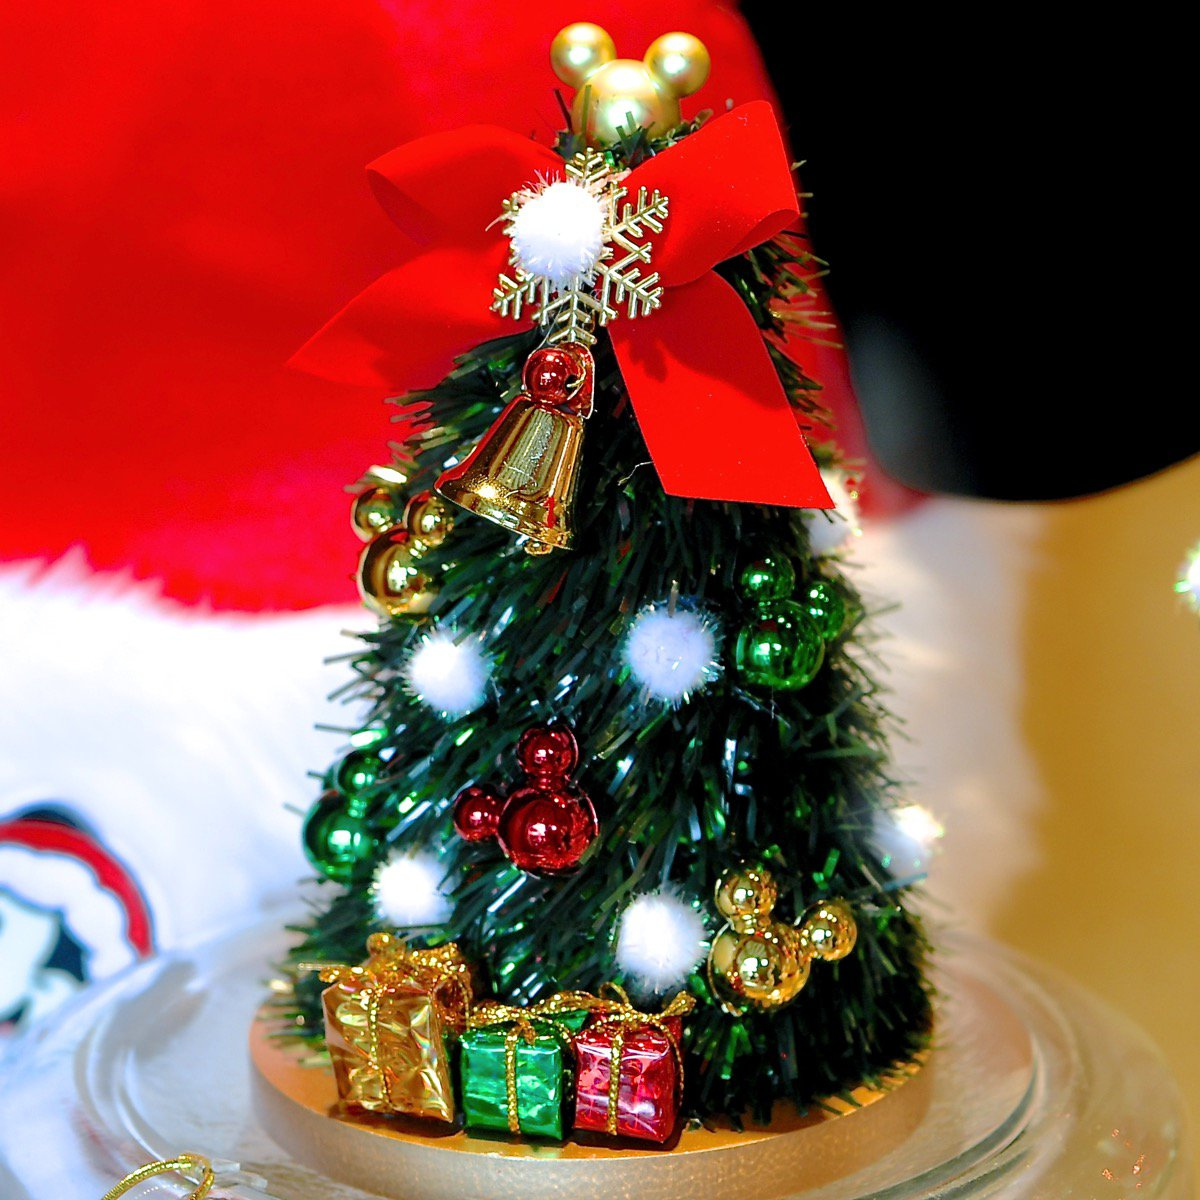 "mezzomikiのディズニーブログ on twitter: ""クリスマスツリーやリース"